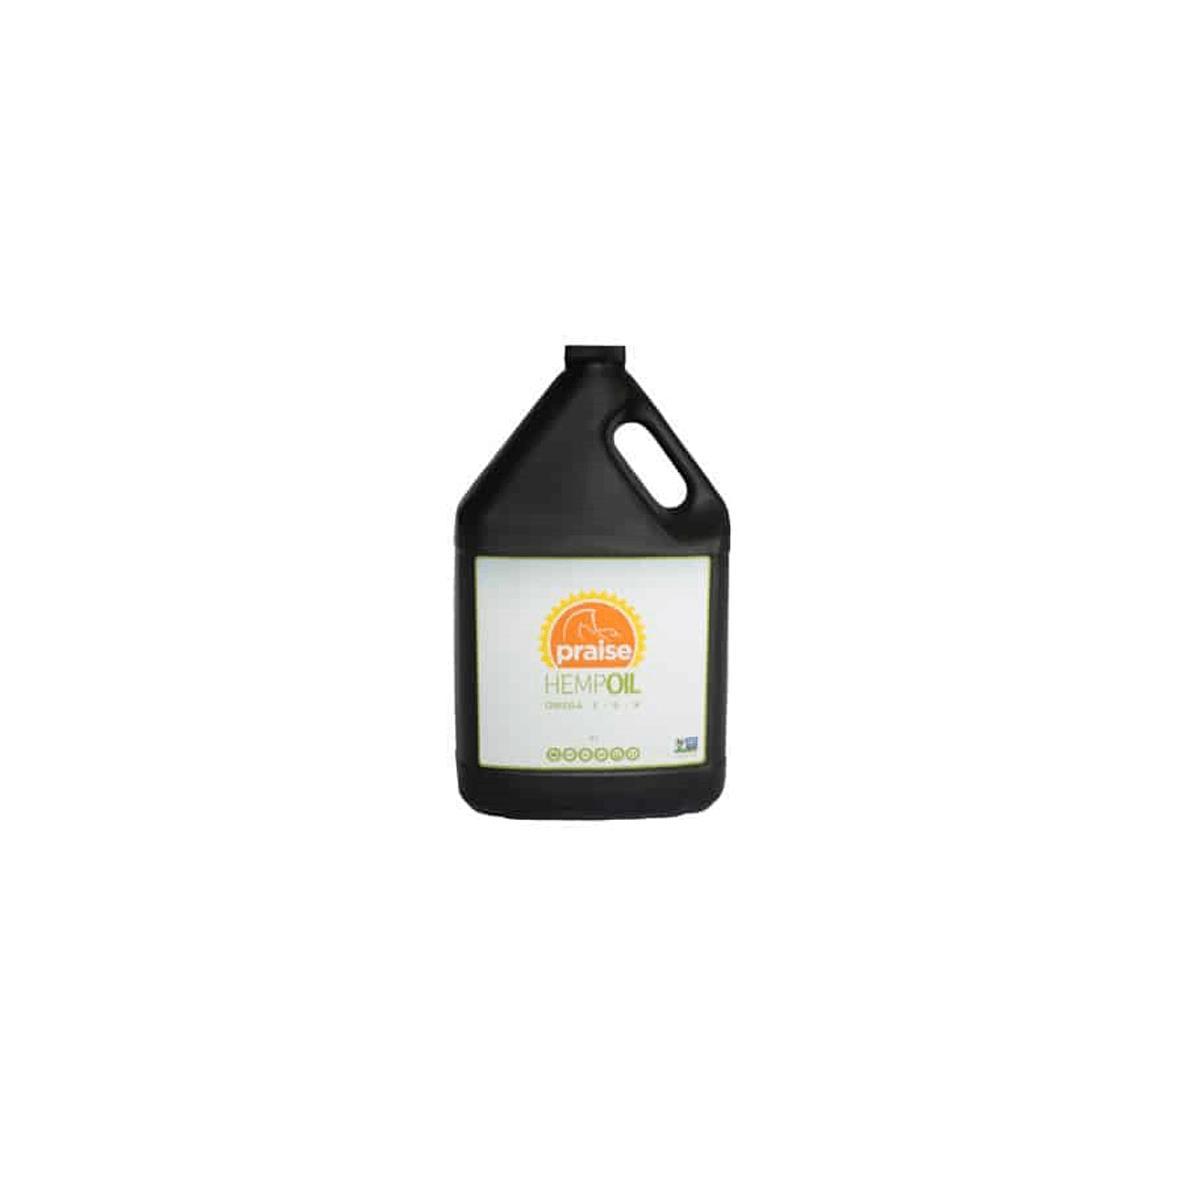 Praise Hemp Oil - 750 ml